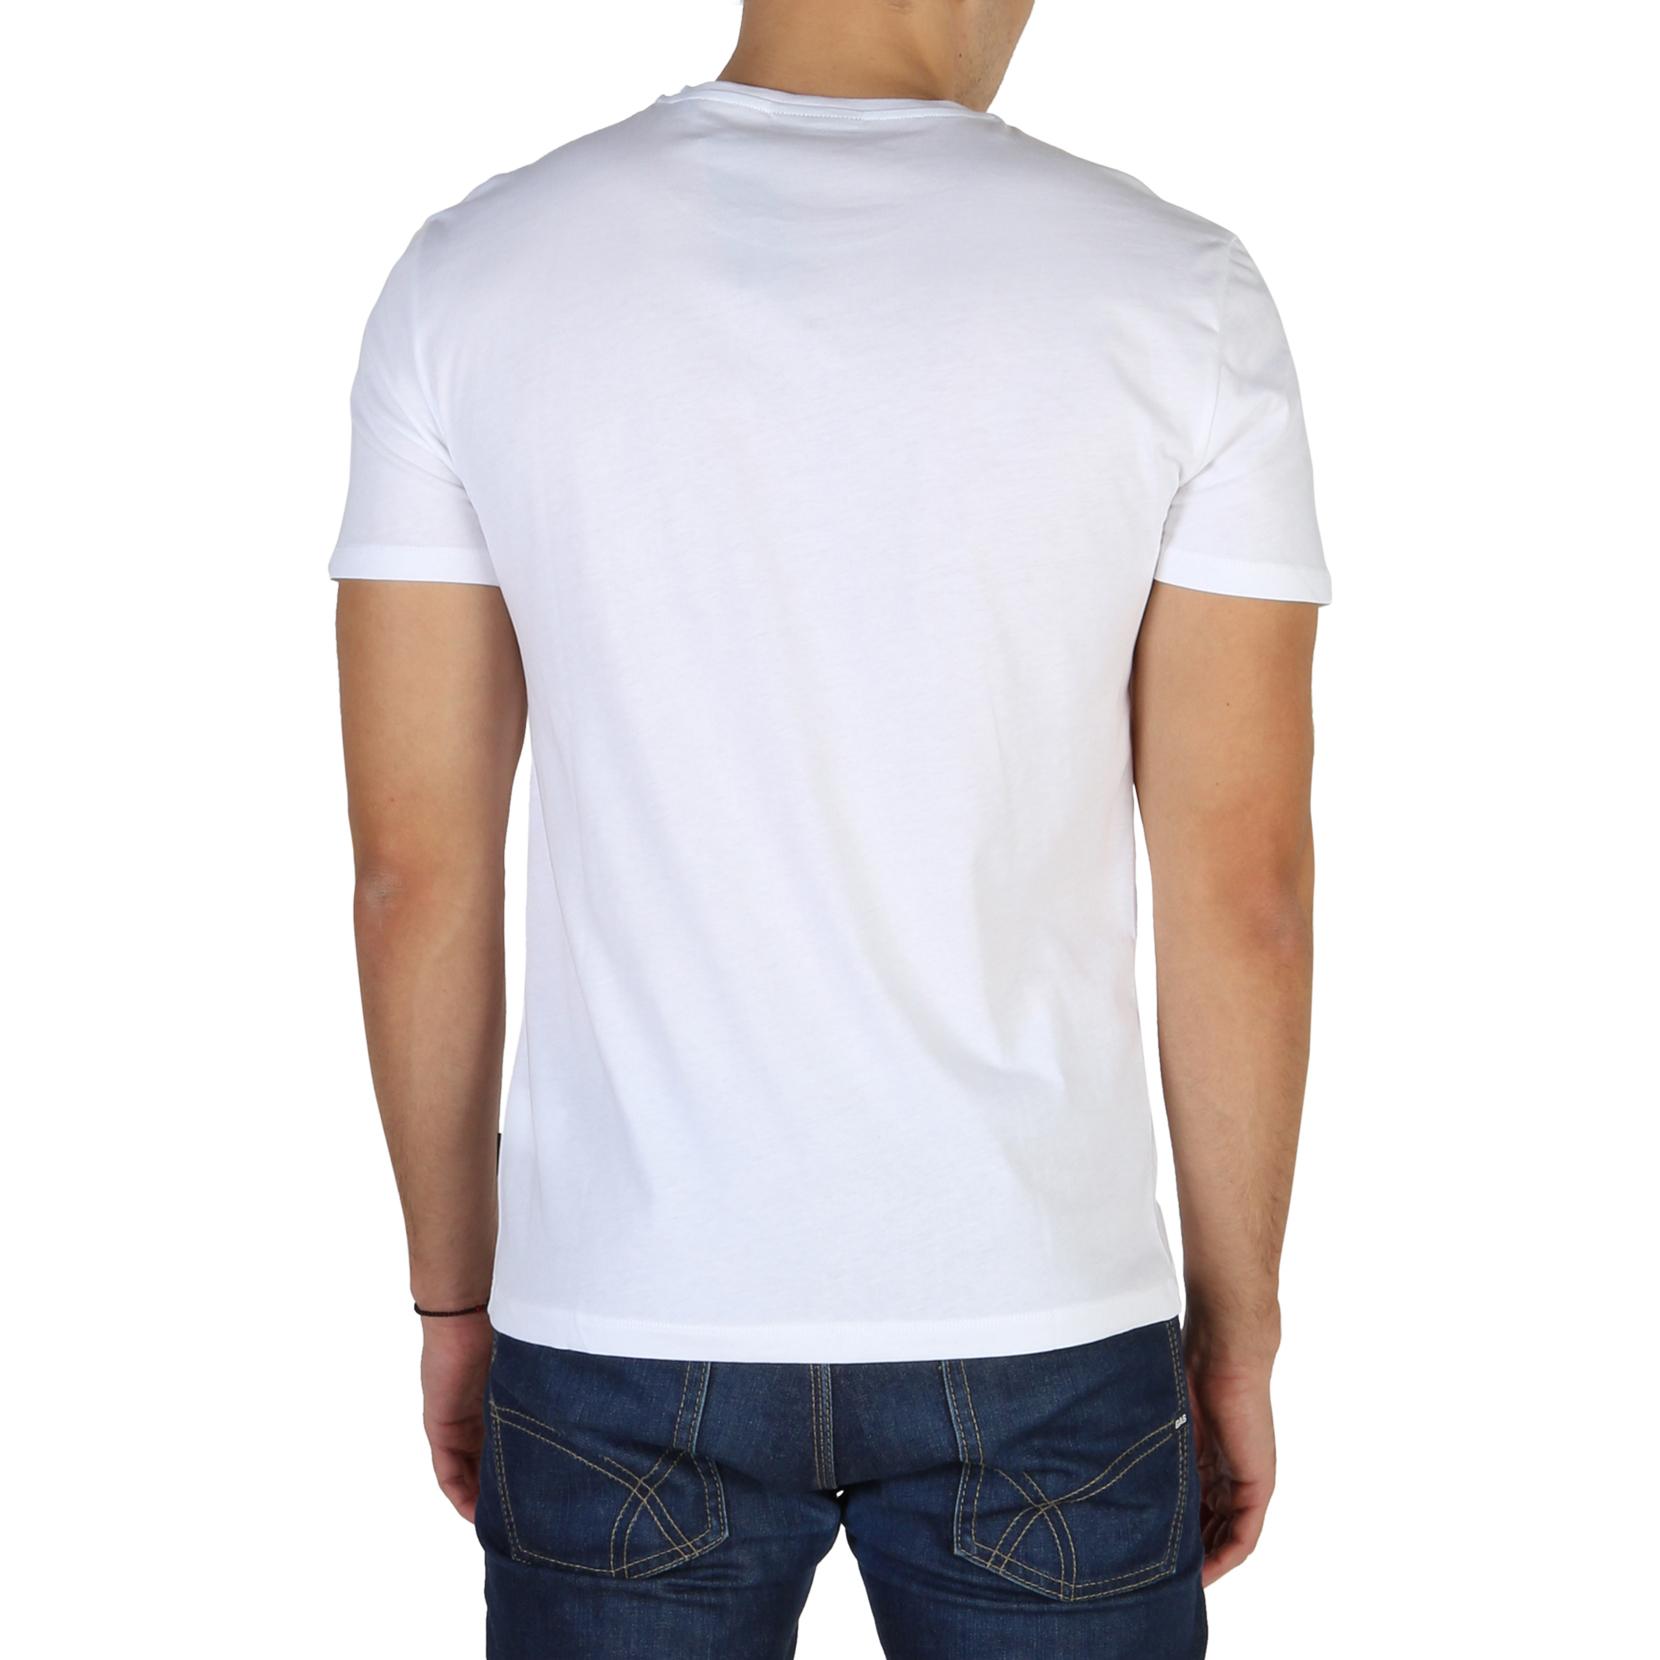 T-SHIRT-Calvin-Klein-K10K100410-Uomo-Bianco-104182-CASUAL-VINTAGE miniatura 2